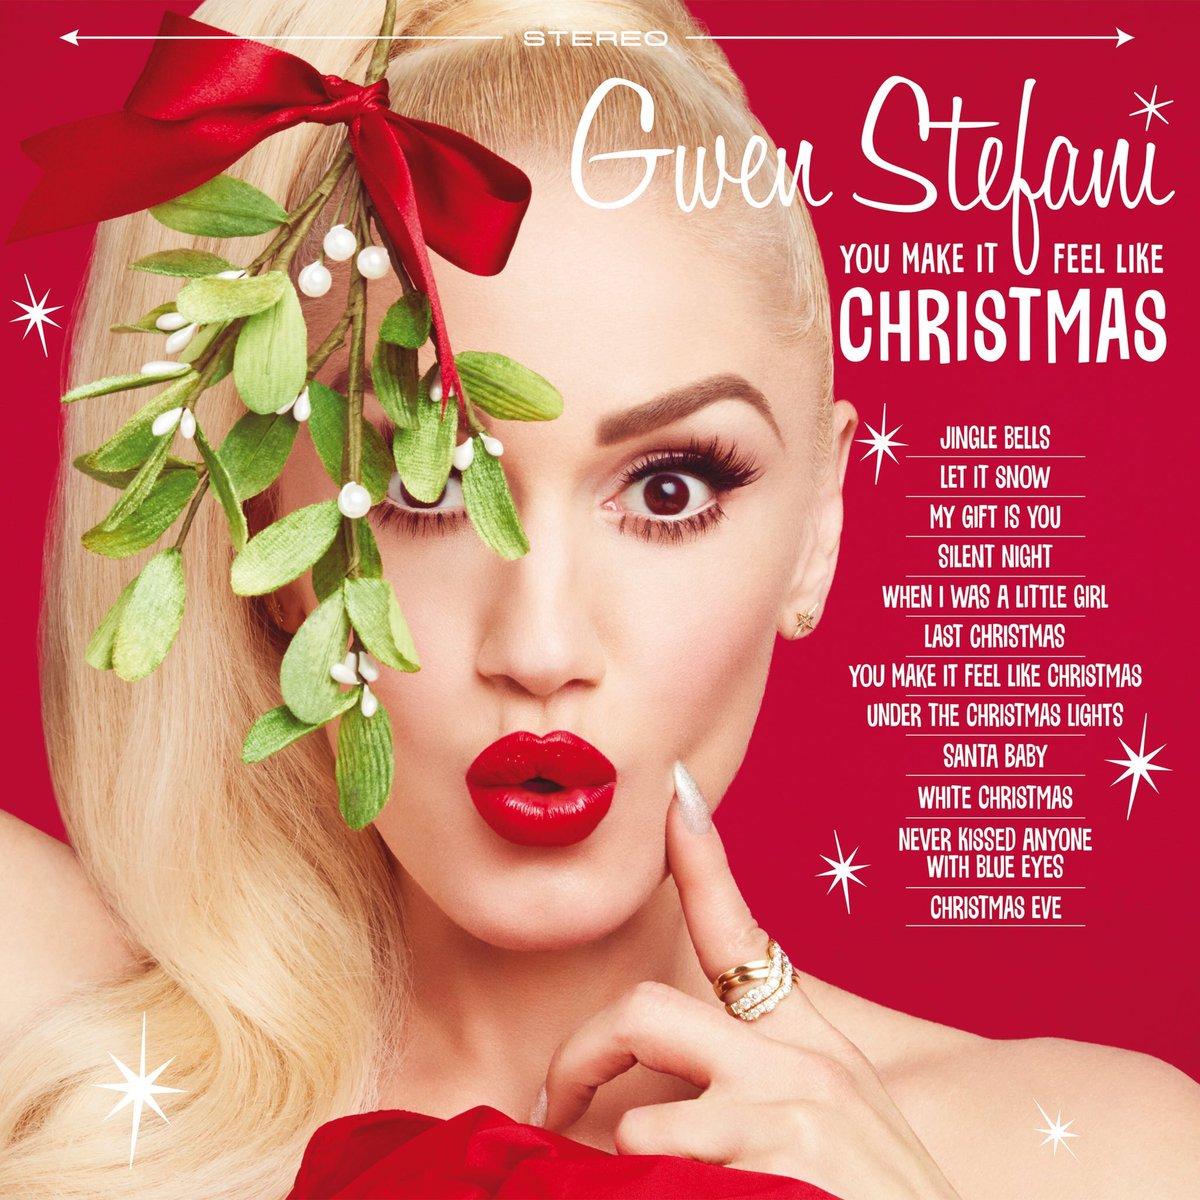 Gwen Stefani You Make It Feel Like Christmas Review